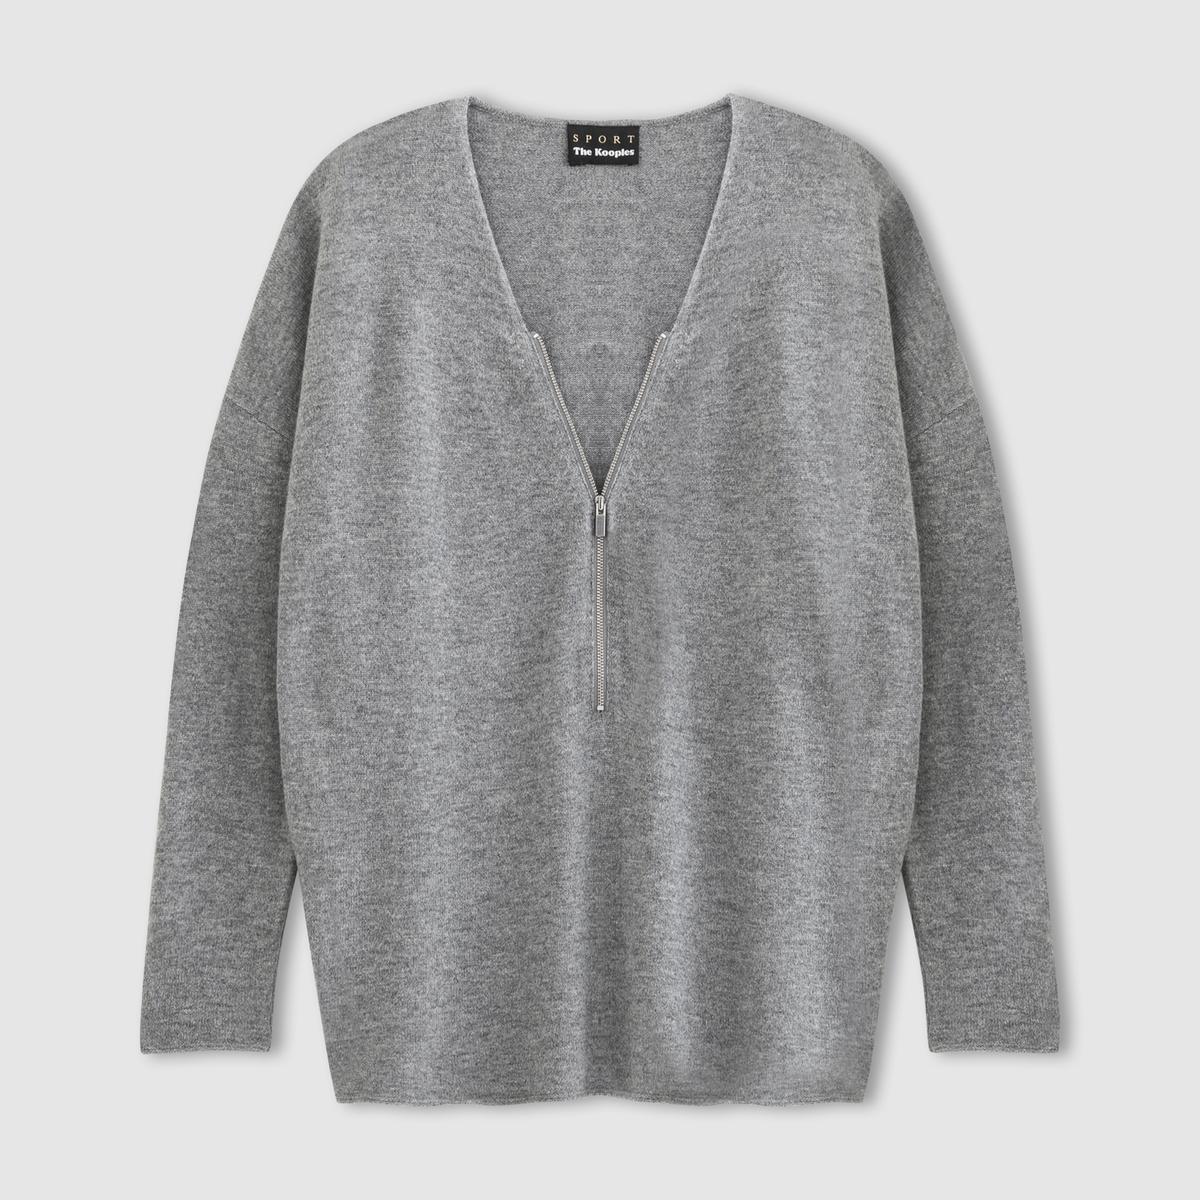 Пуловер 1237S от La Redoute